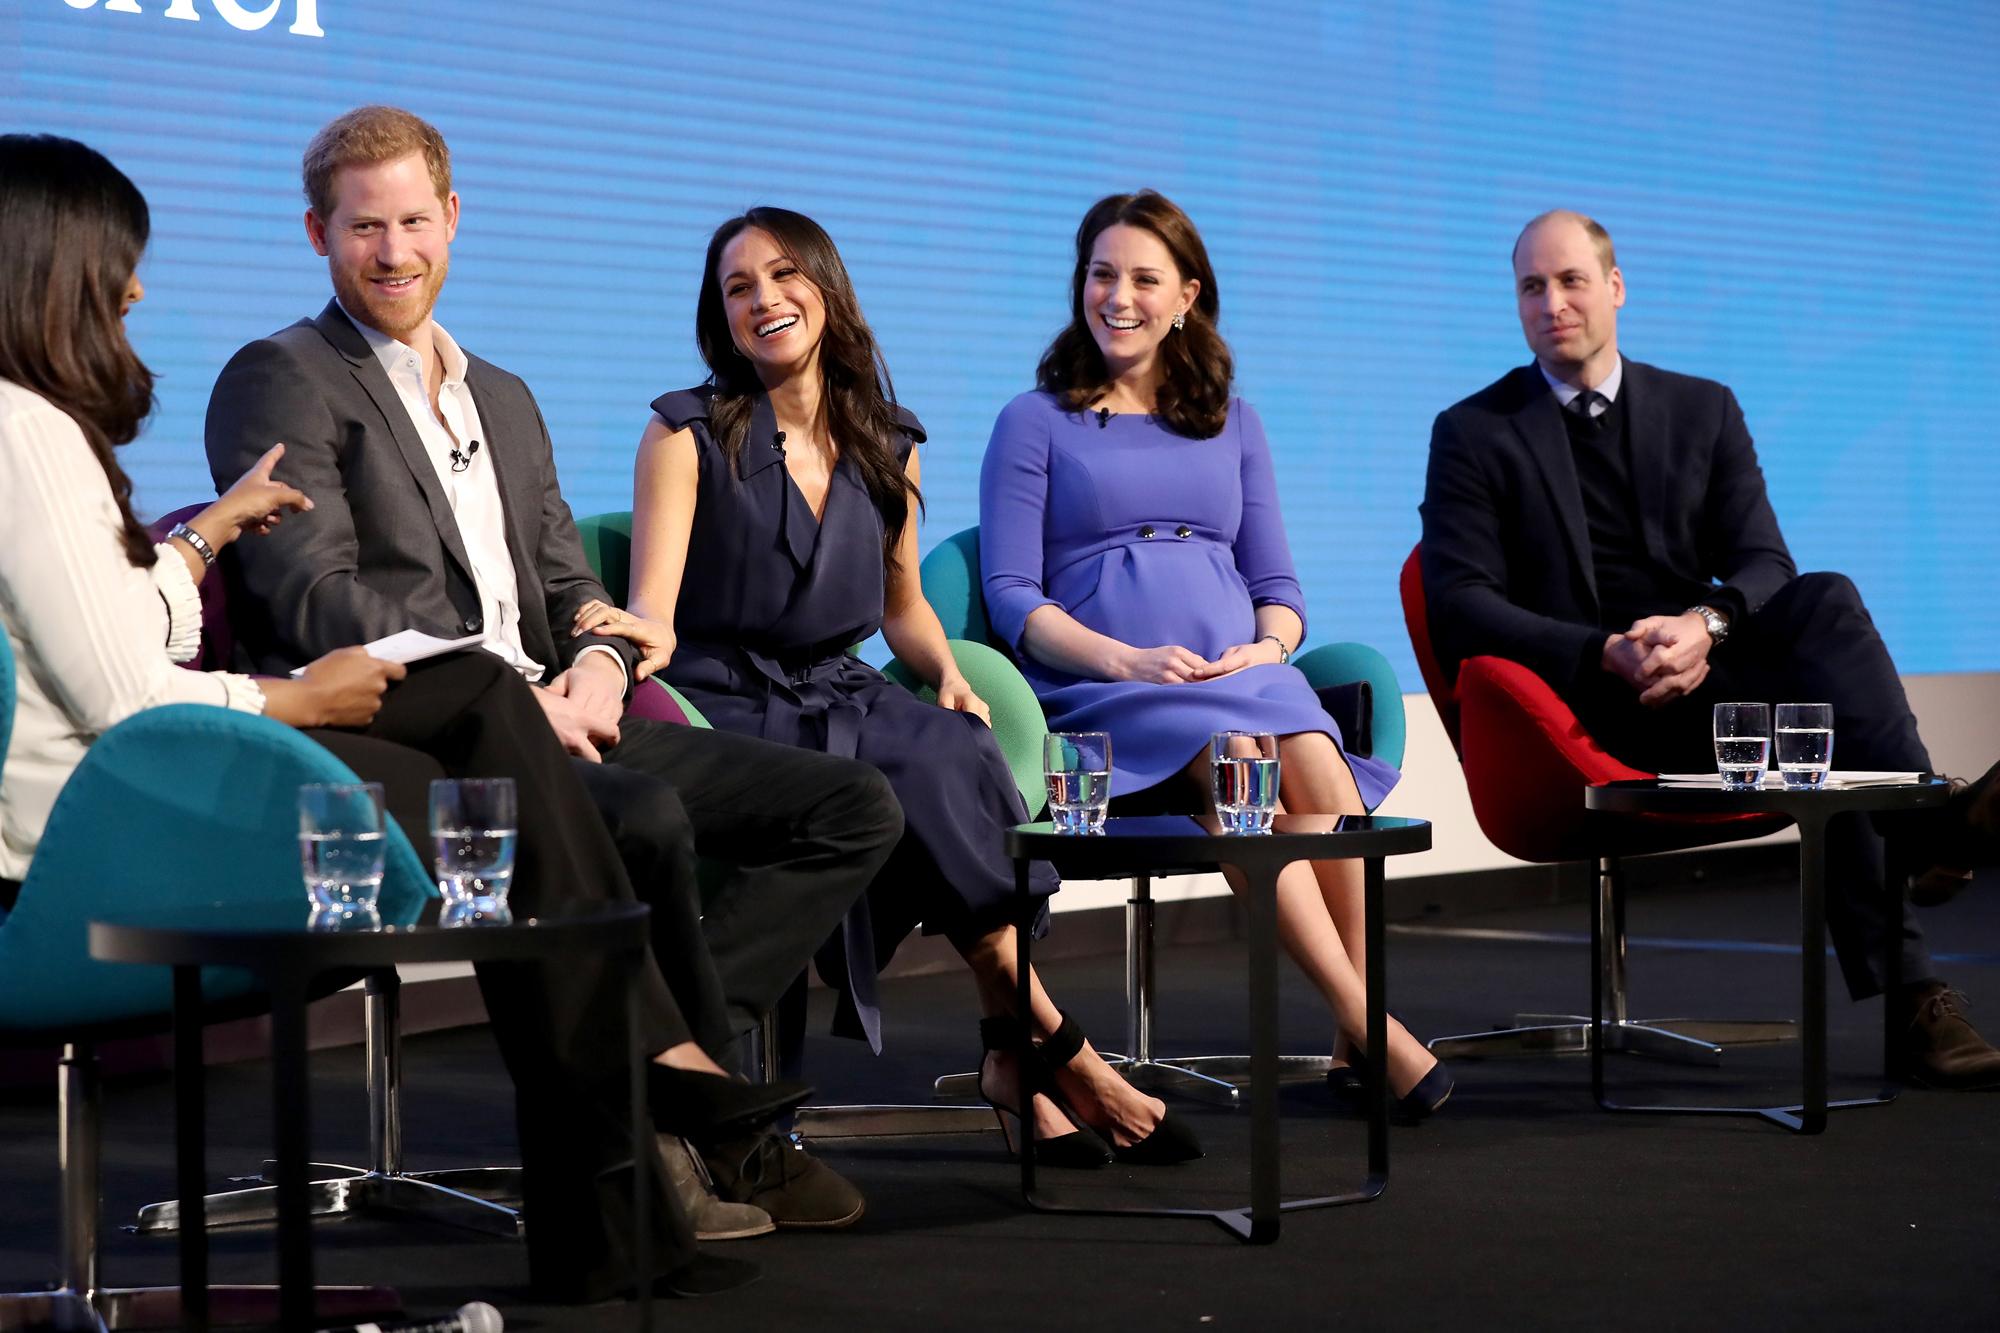 First Annual Royal Foundation Forum, London, UK - 28 Feb 2018